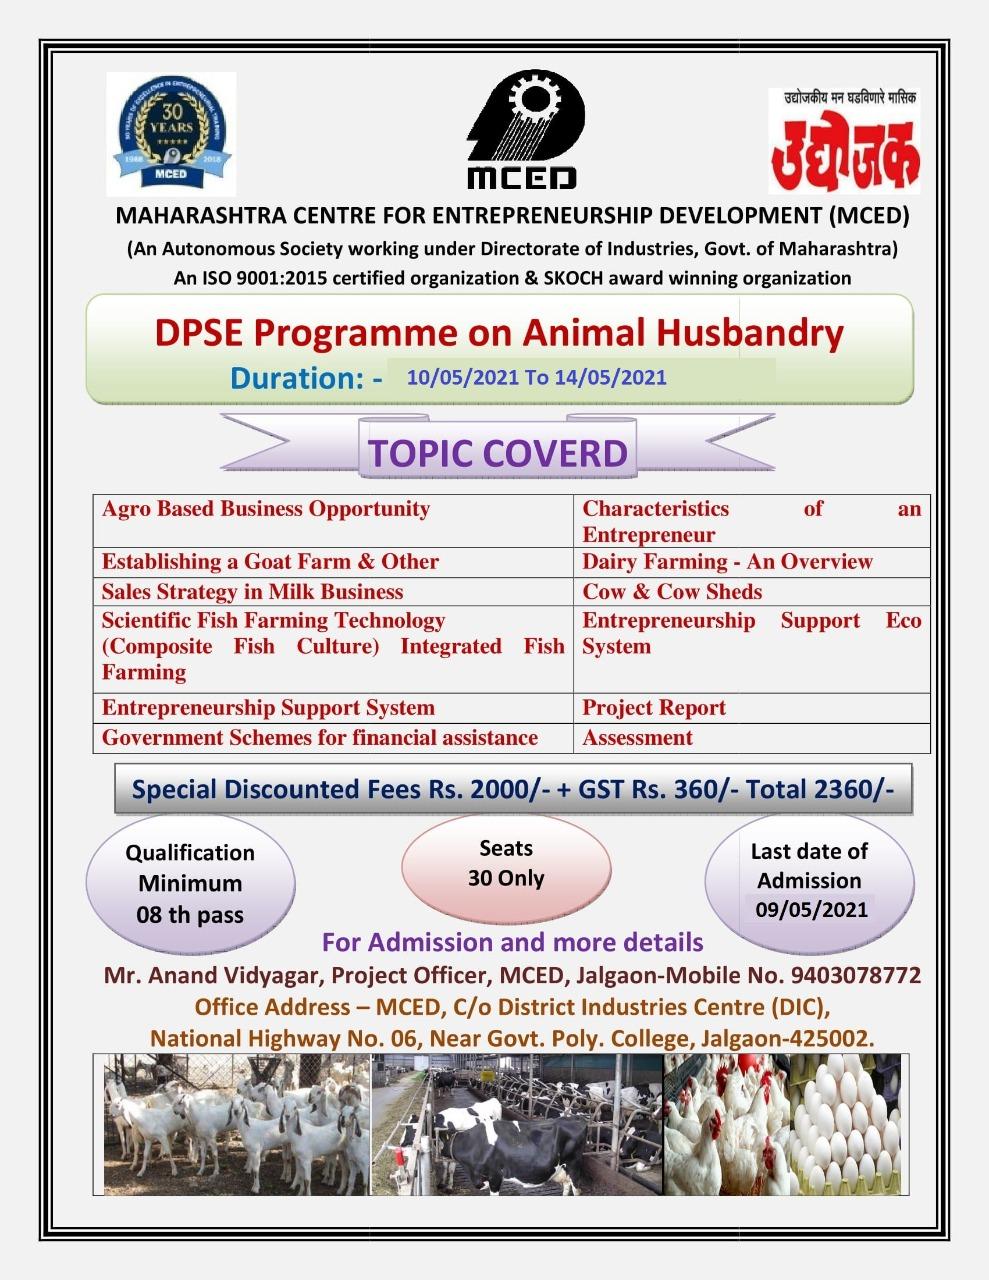 DPSE Programme on Animal Husbandry